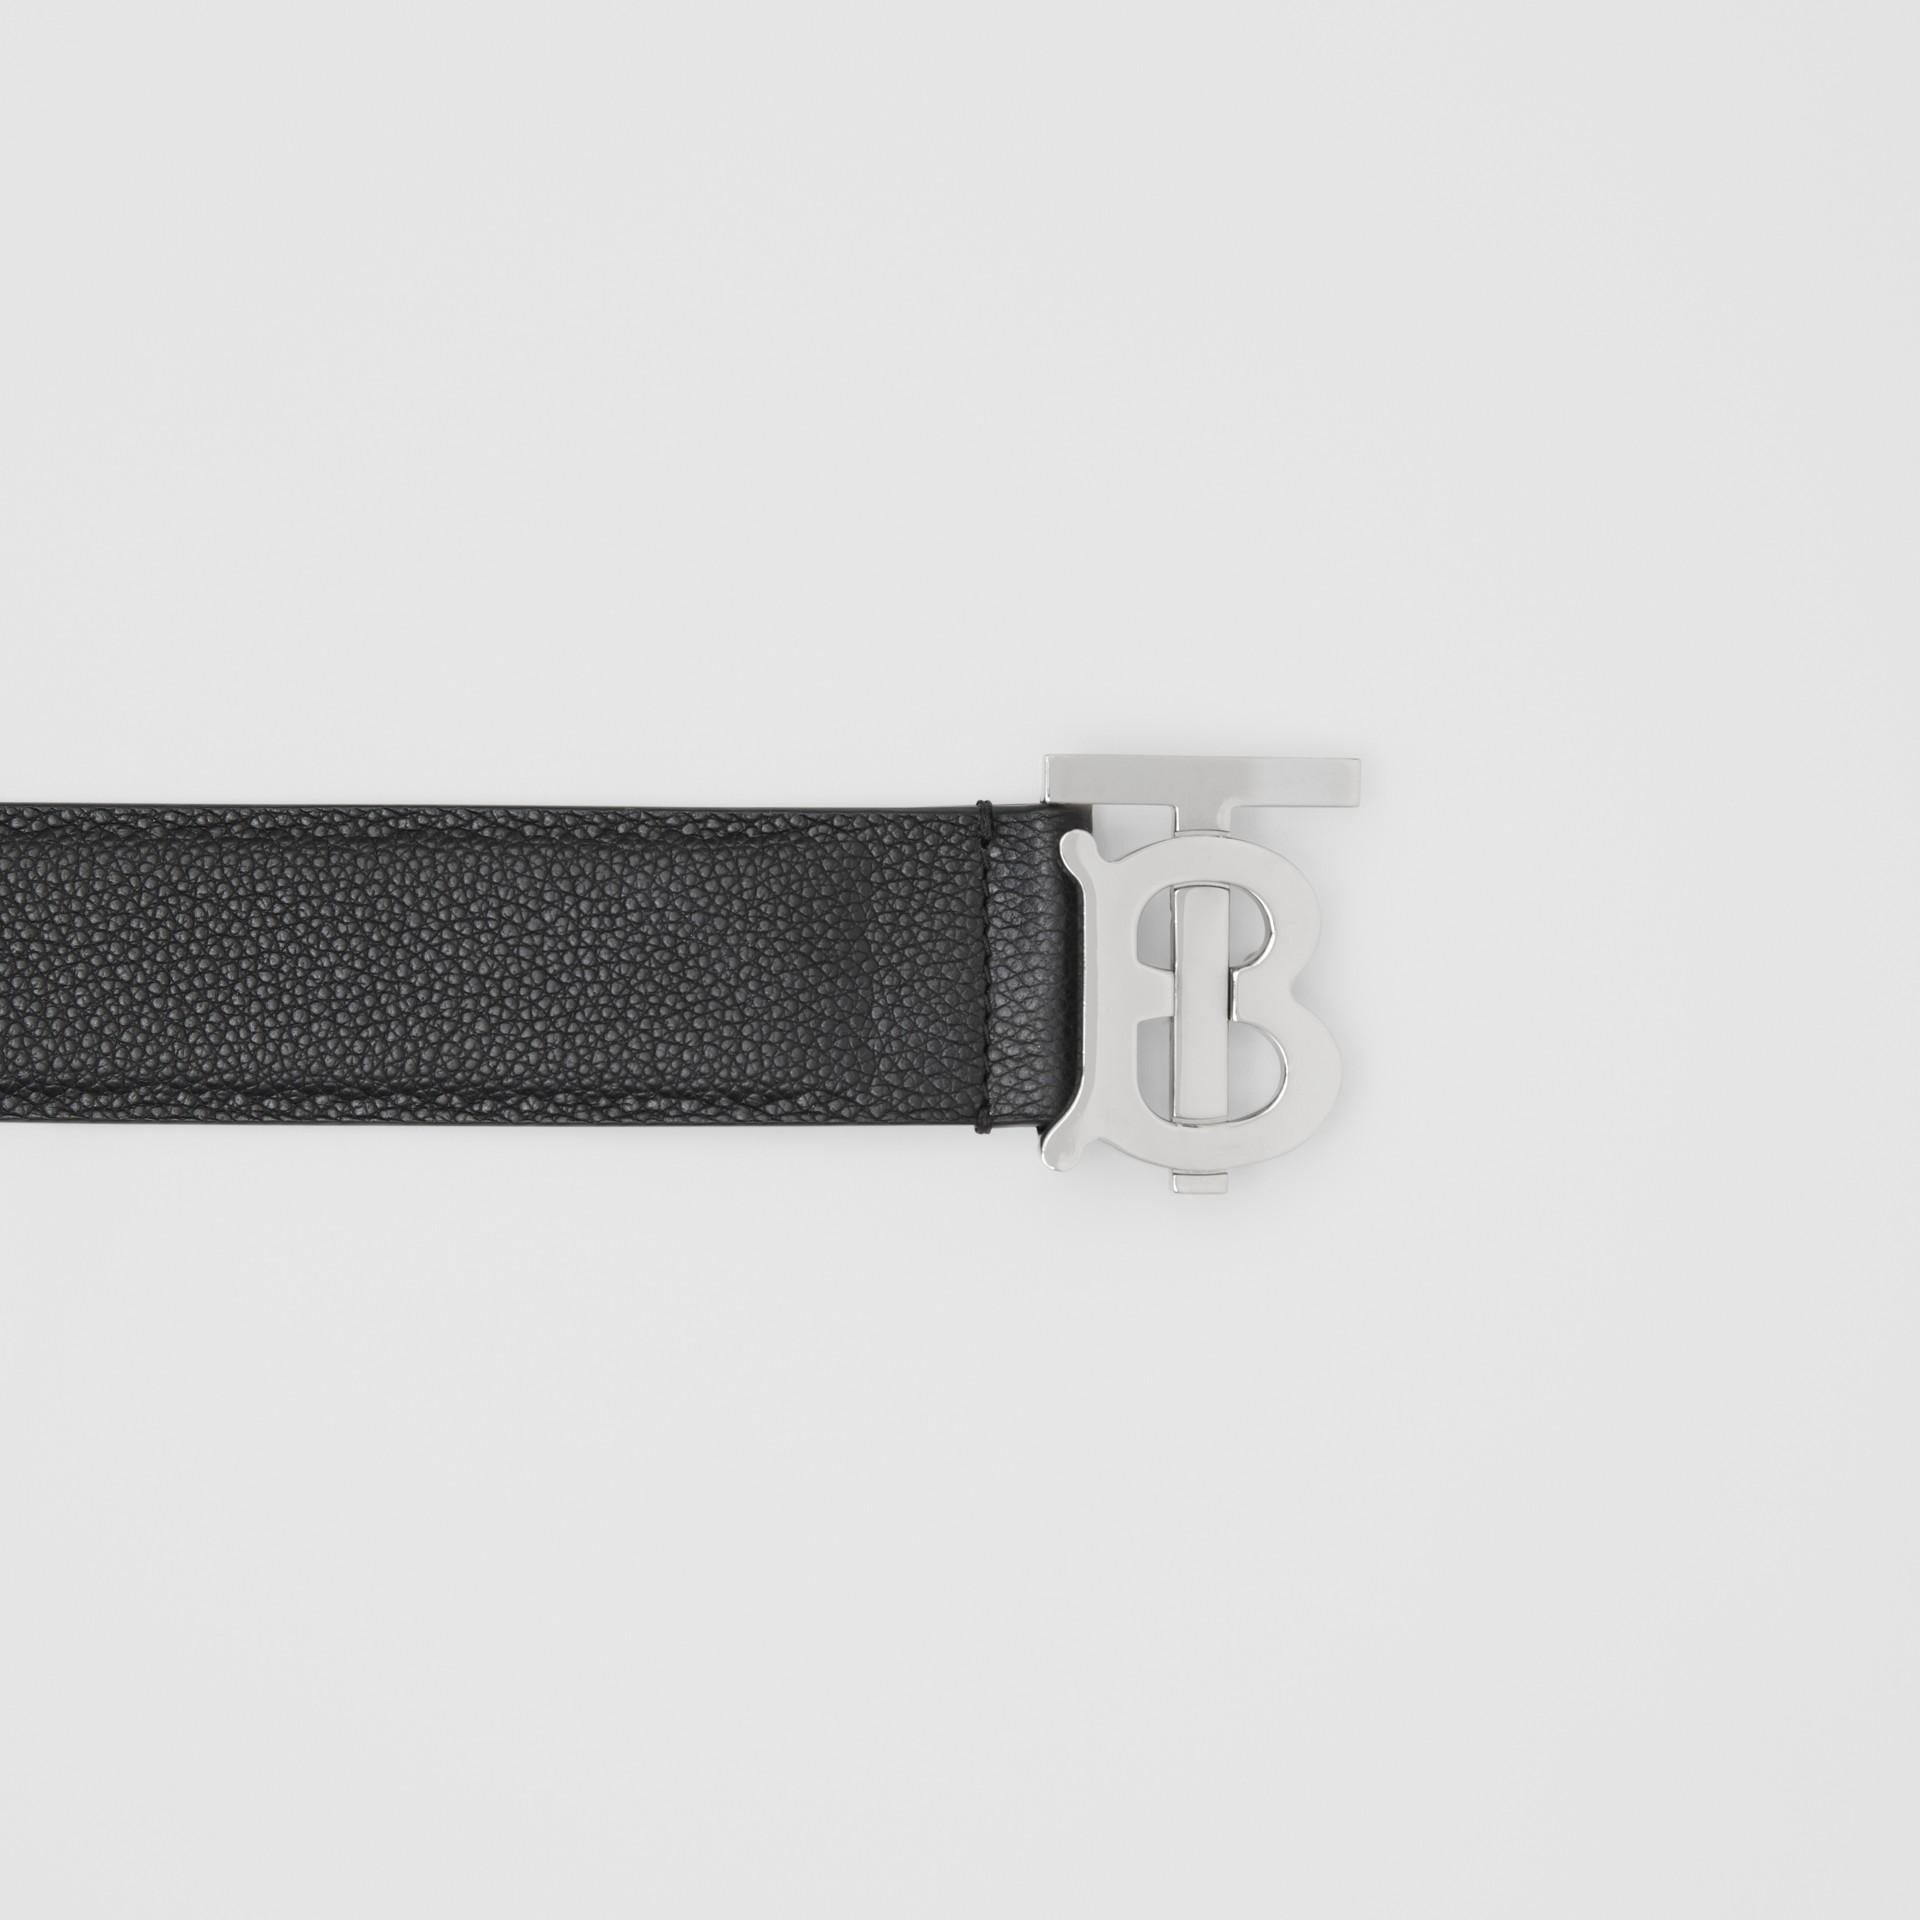 Monogram Motif Grainy Leather Belt in Black - Men | Burberry Australia - gallery image 5